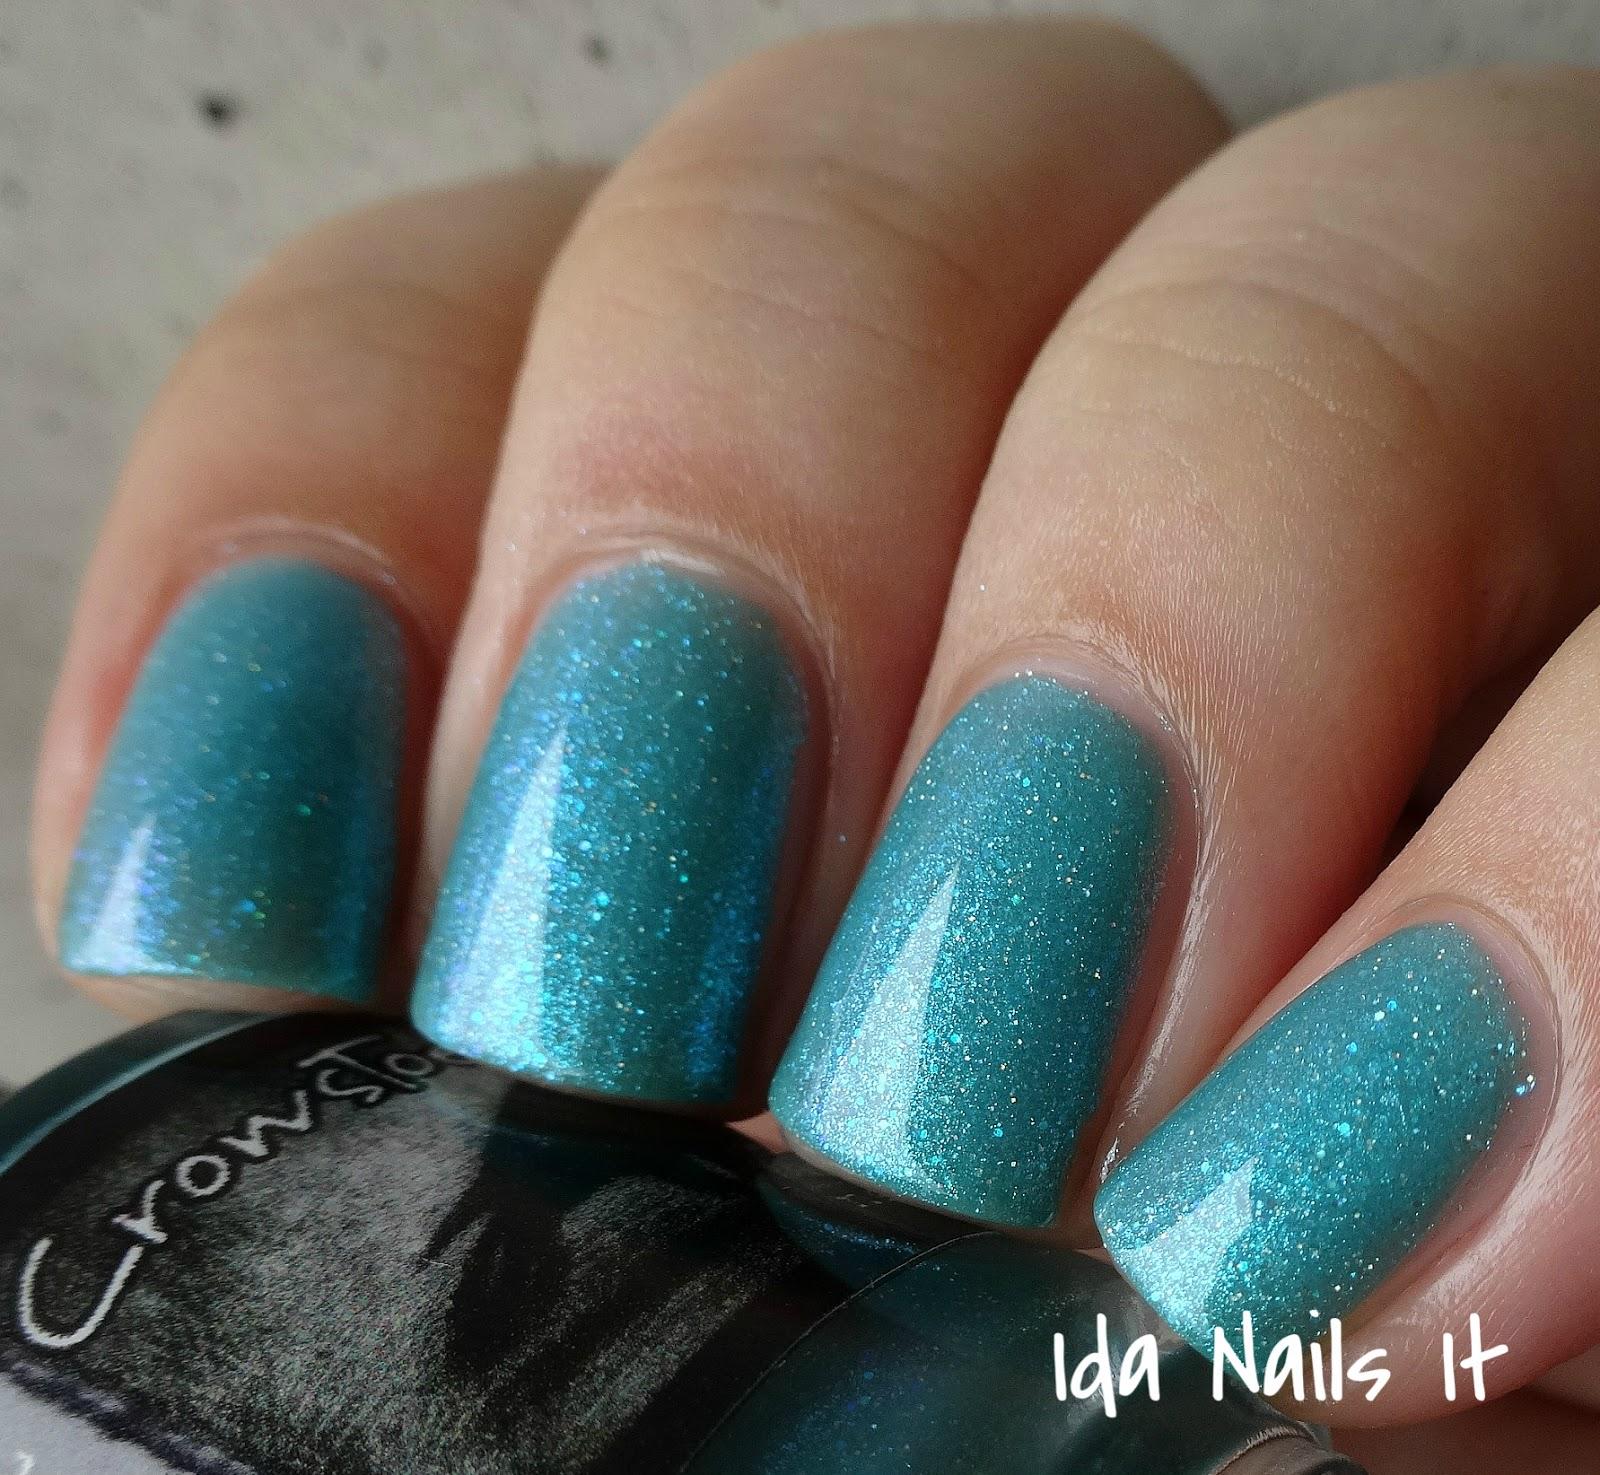 Ida Nails It: Ida Nails It Summer Giveaway!